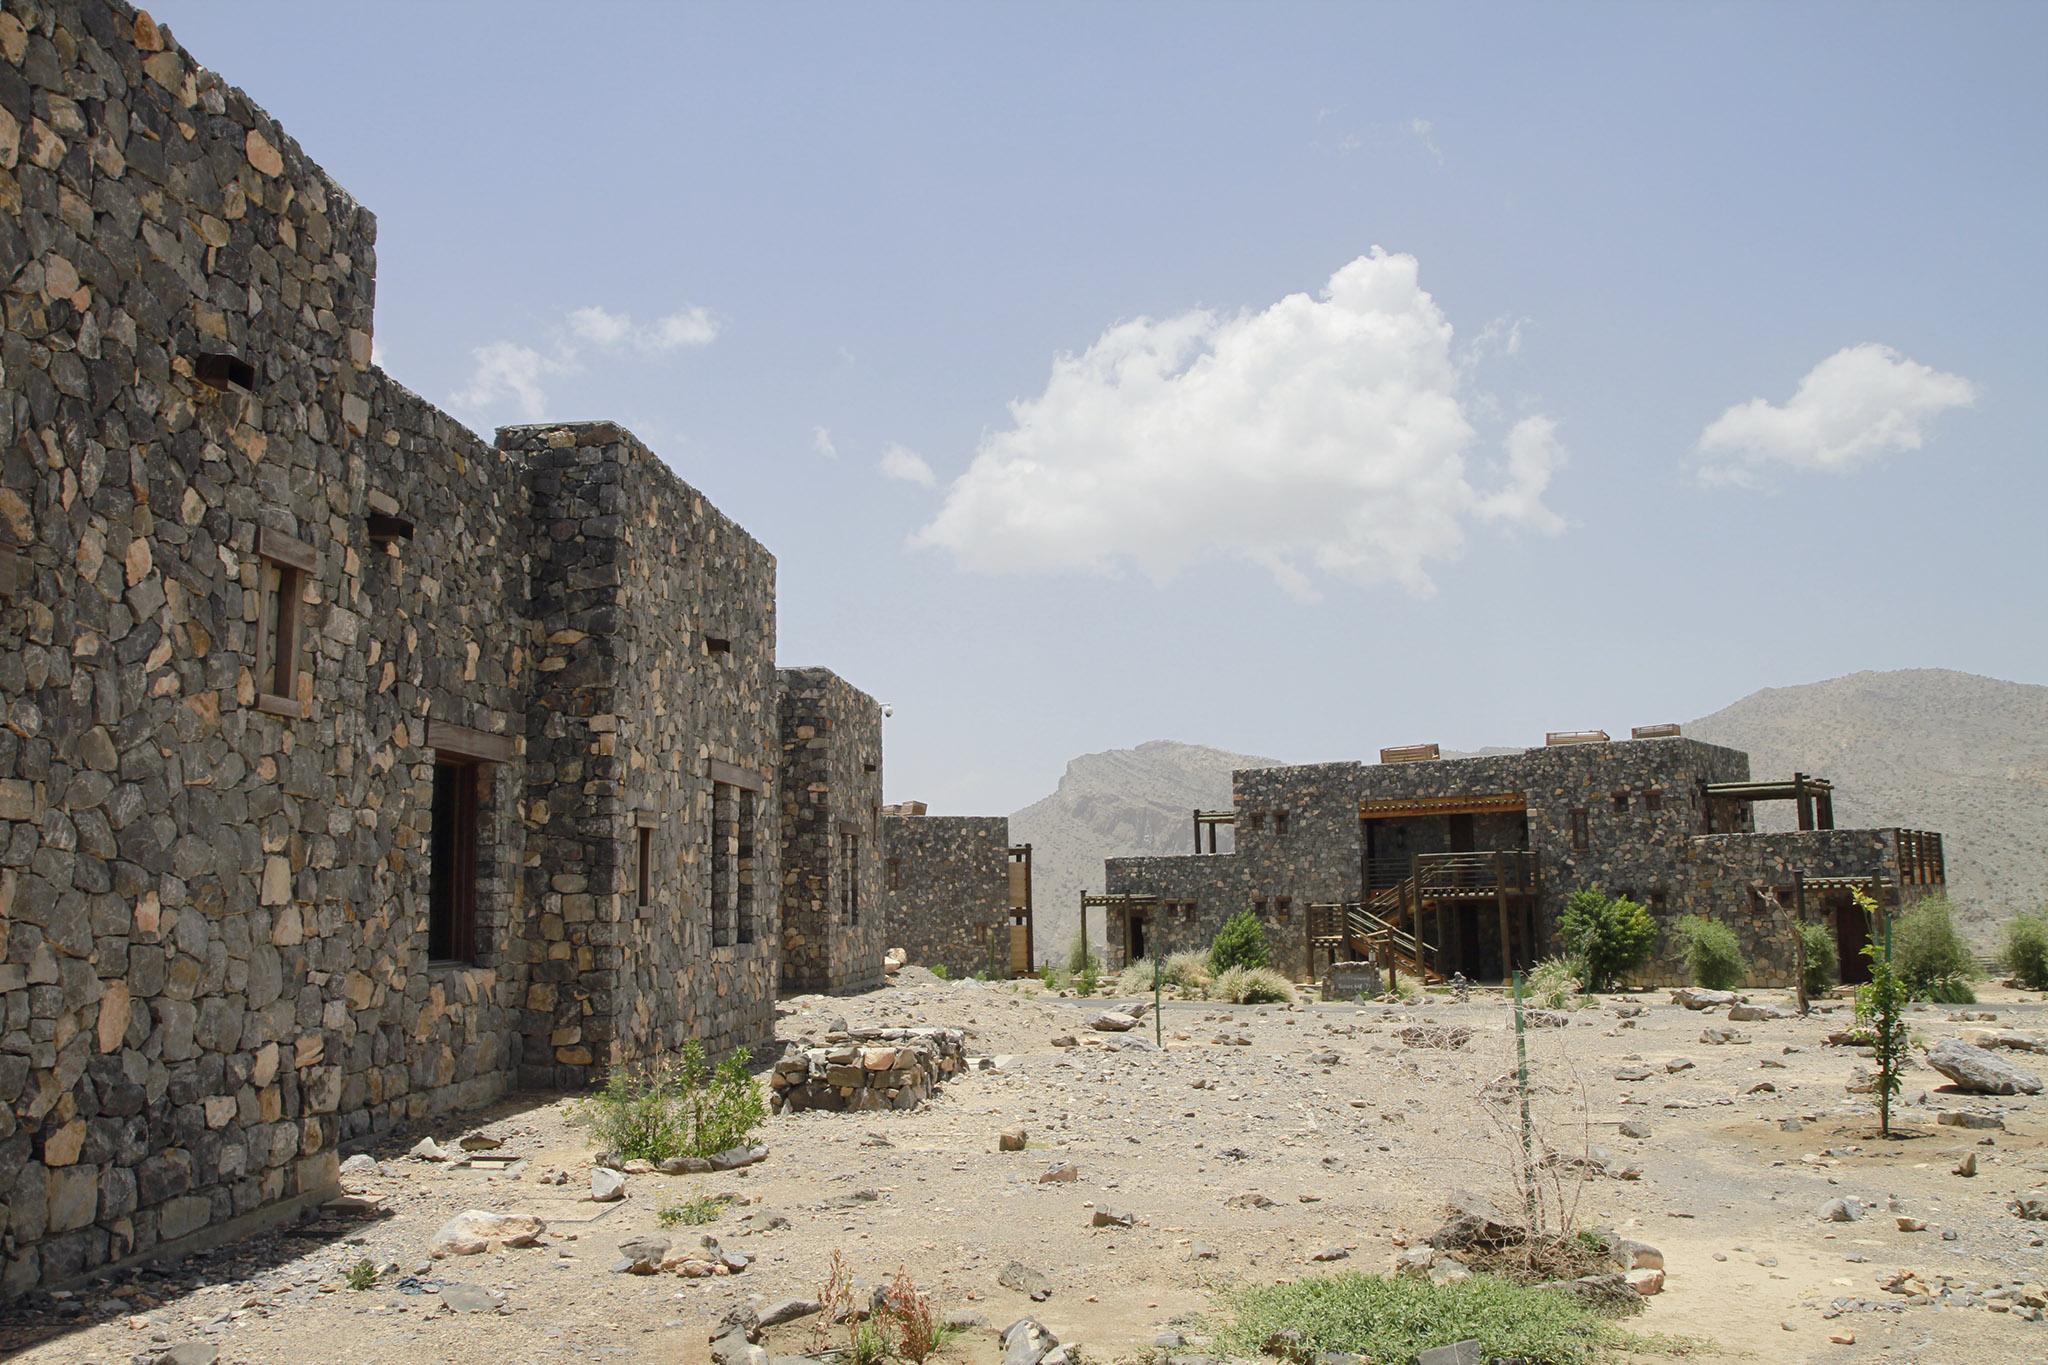 2017-04-Alila-Jabal-Akhdar - alila-jabal-akhdar-oman-nectarandpulse-architecture-1.jpg